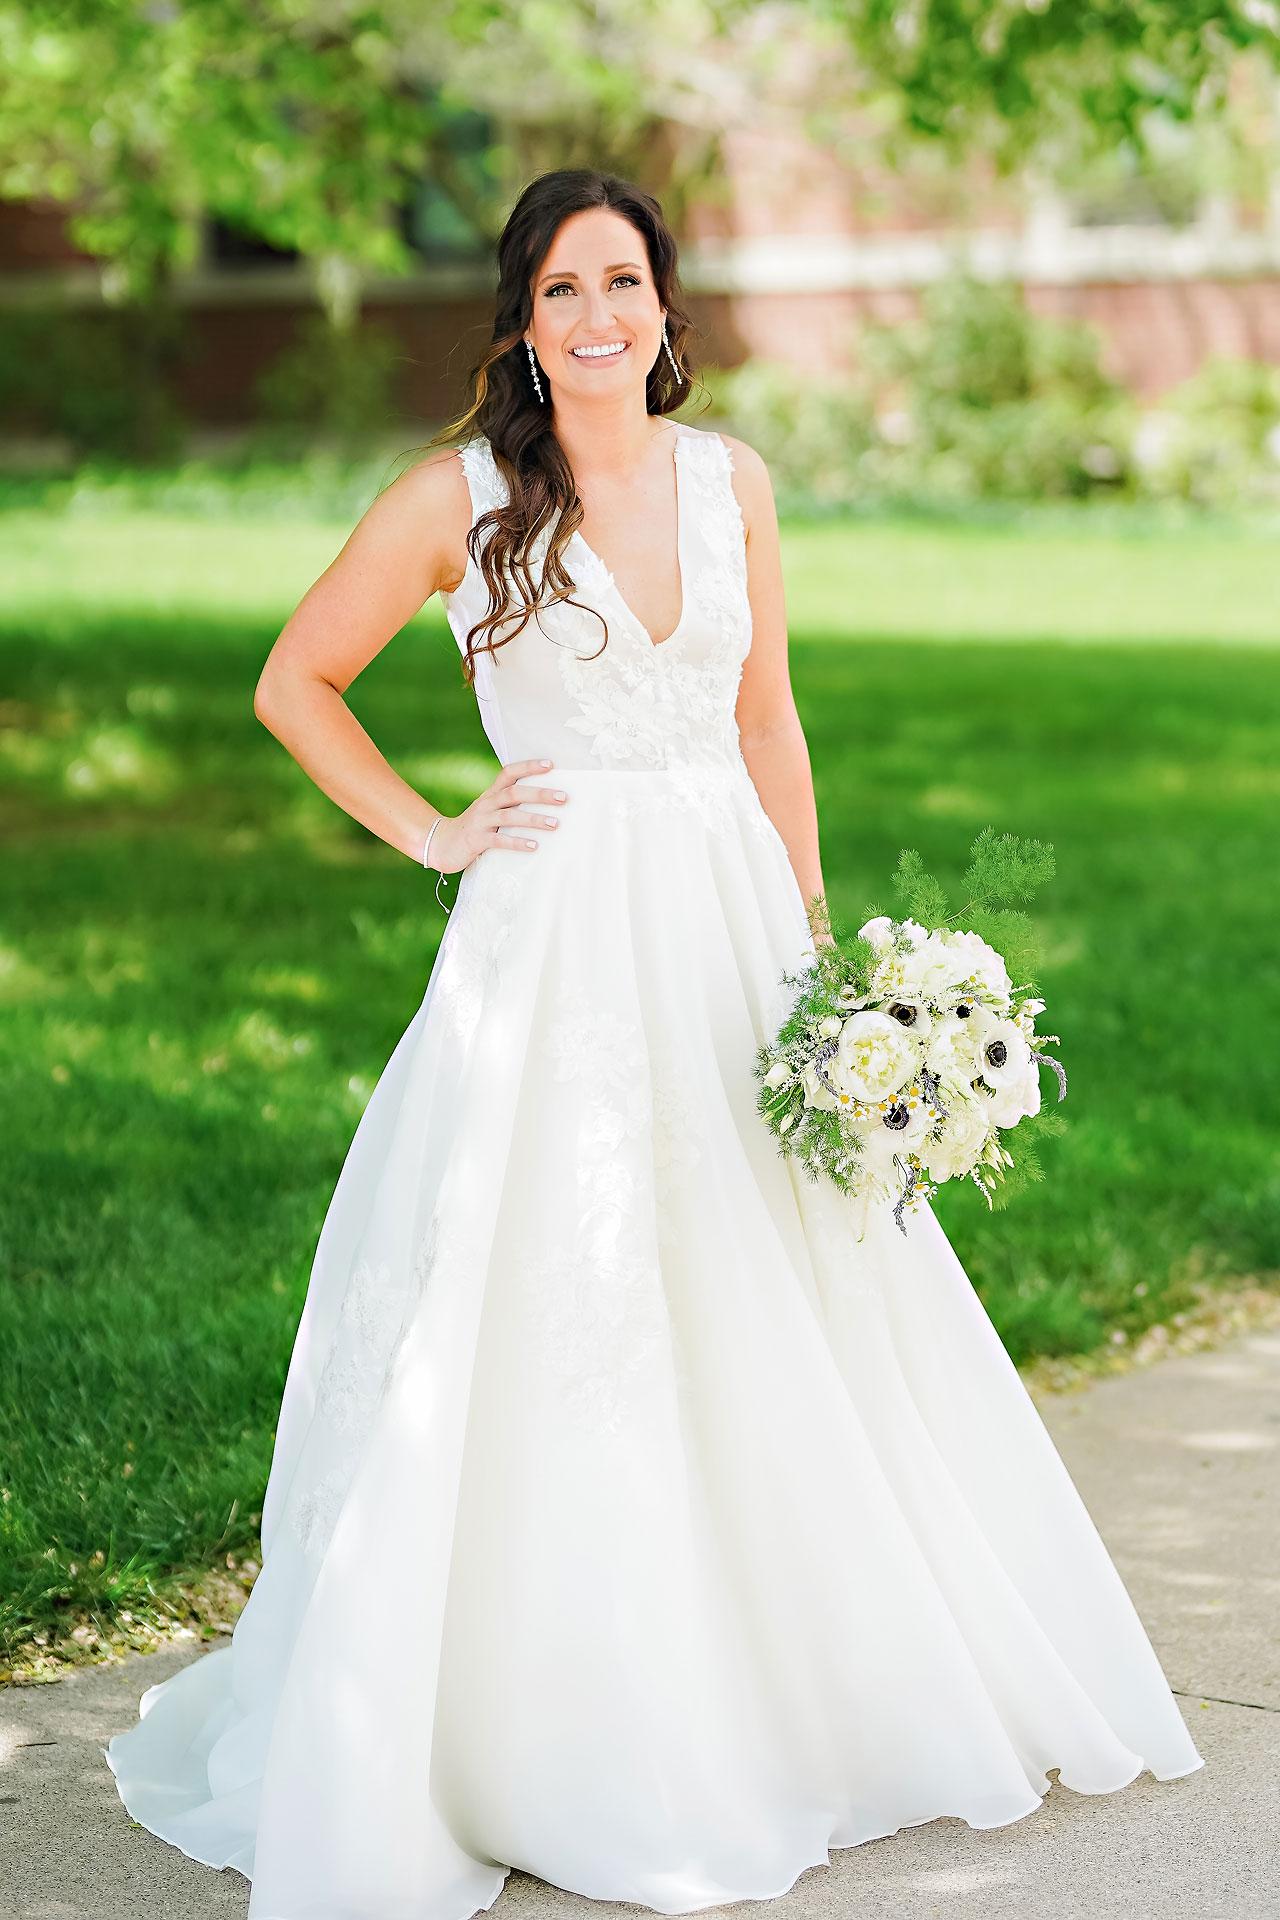 MacKinze John Lafayette Indiana Purdue Wedding 115